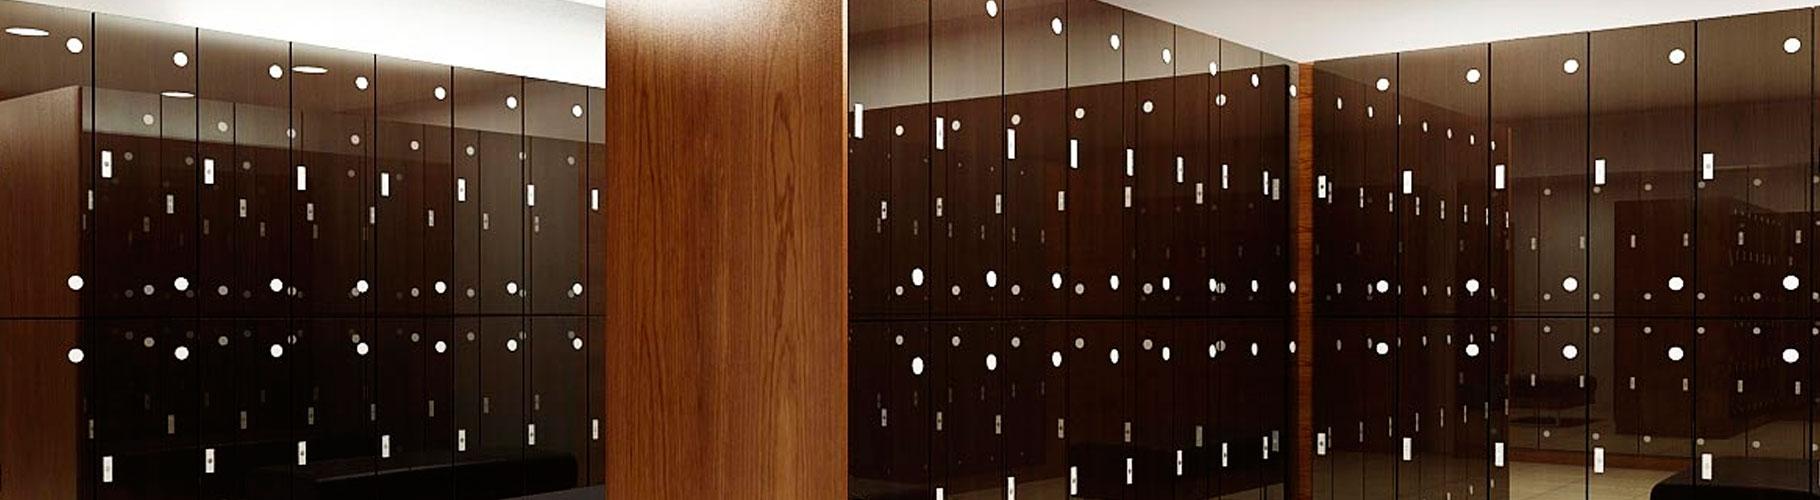 Lockers de PVC de alta calidad - Lockers México